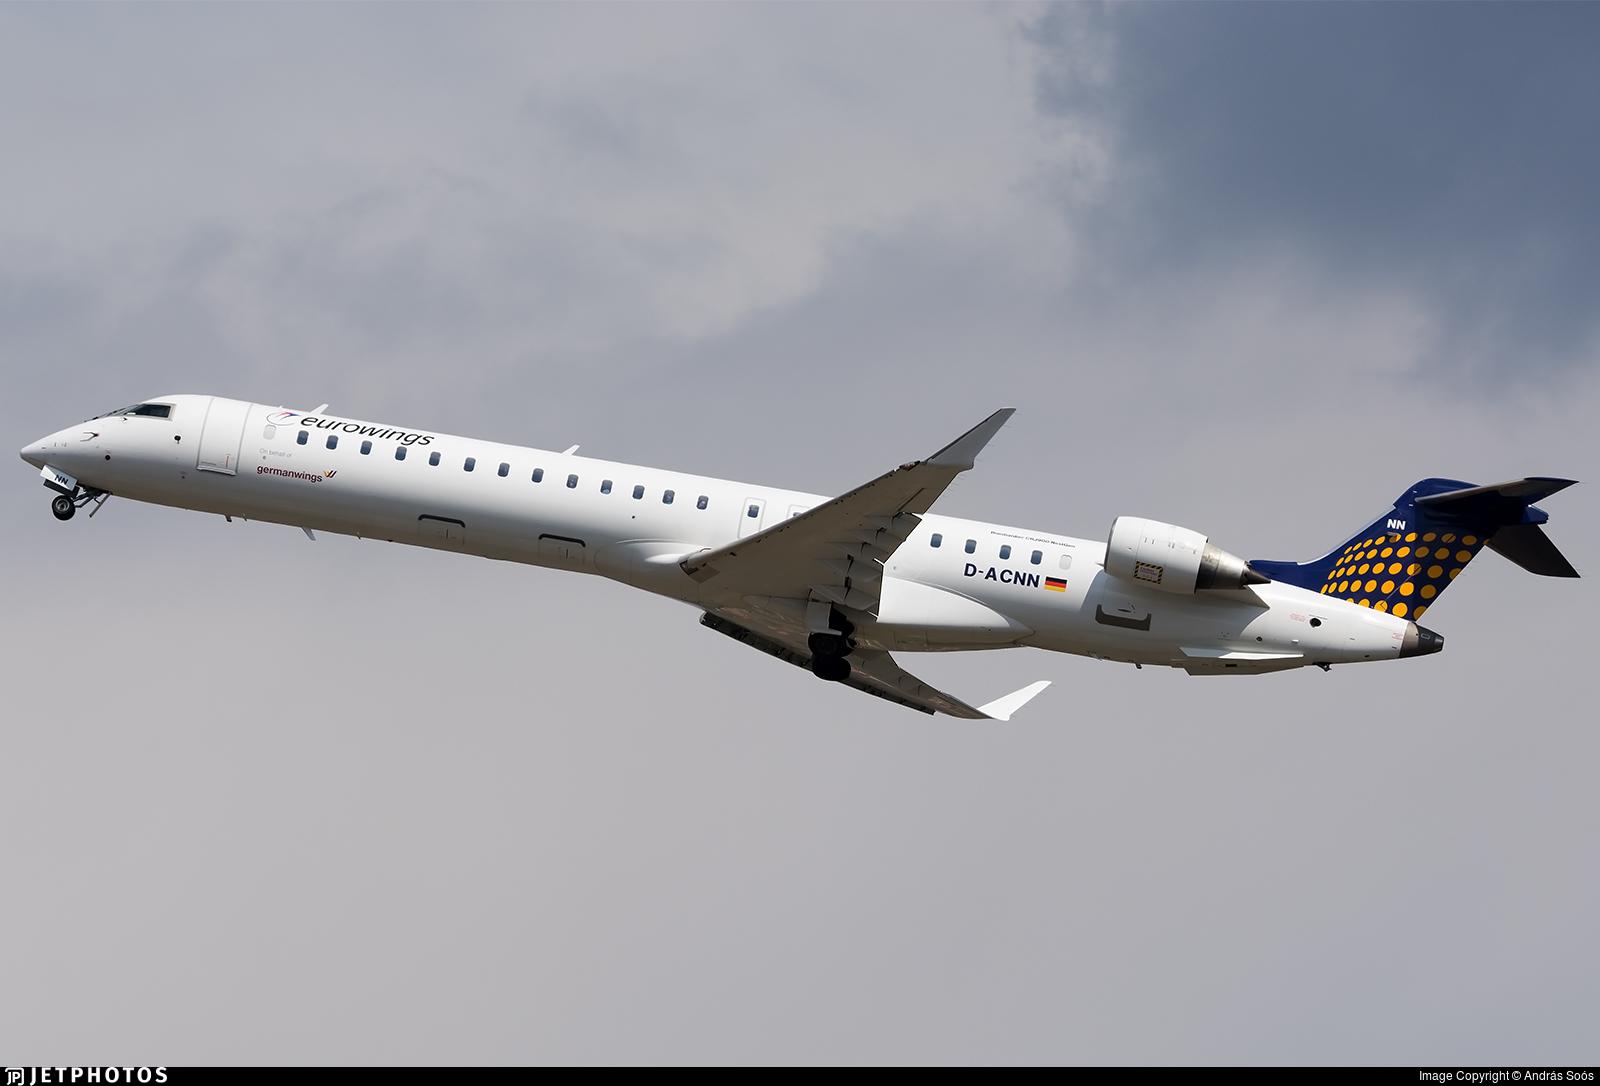 D-ACNN - Bombardier CRJ-900LR - Eurowings